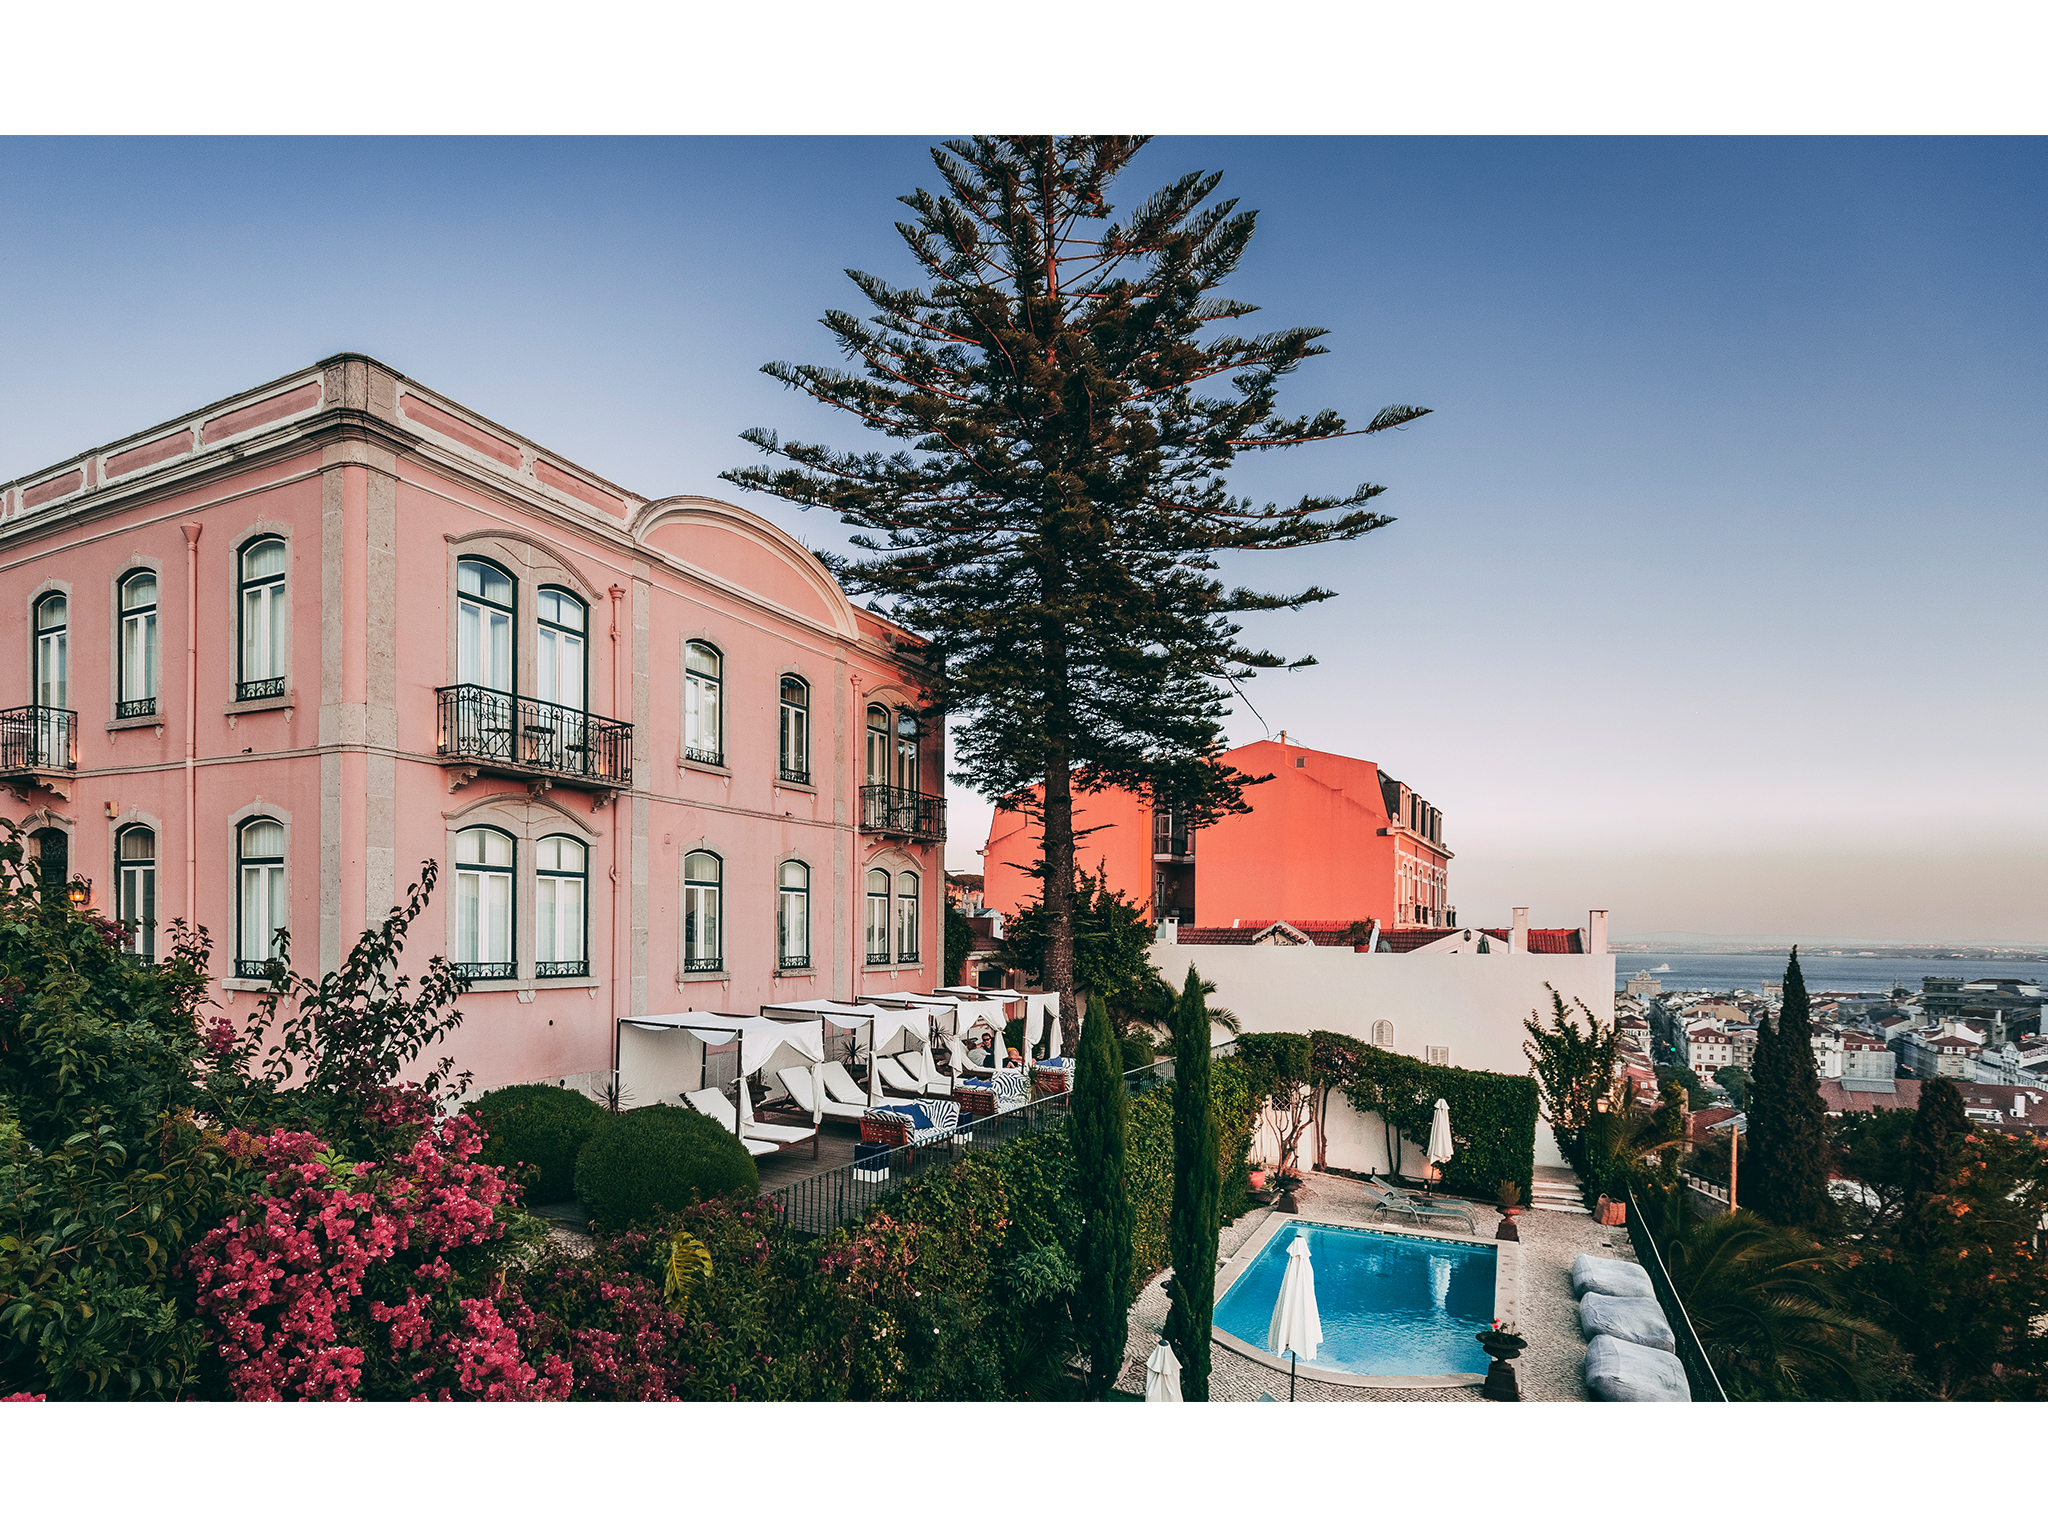 Hotel, Botique Hotel, Torel Palace Lisboa